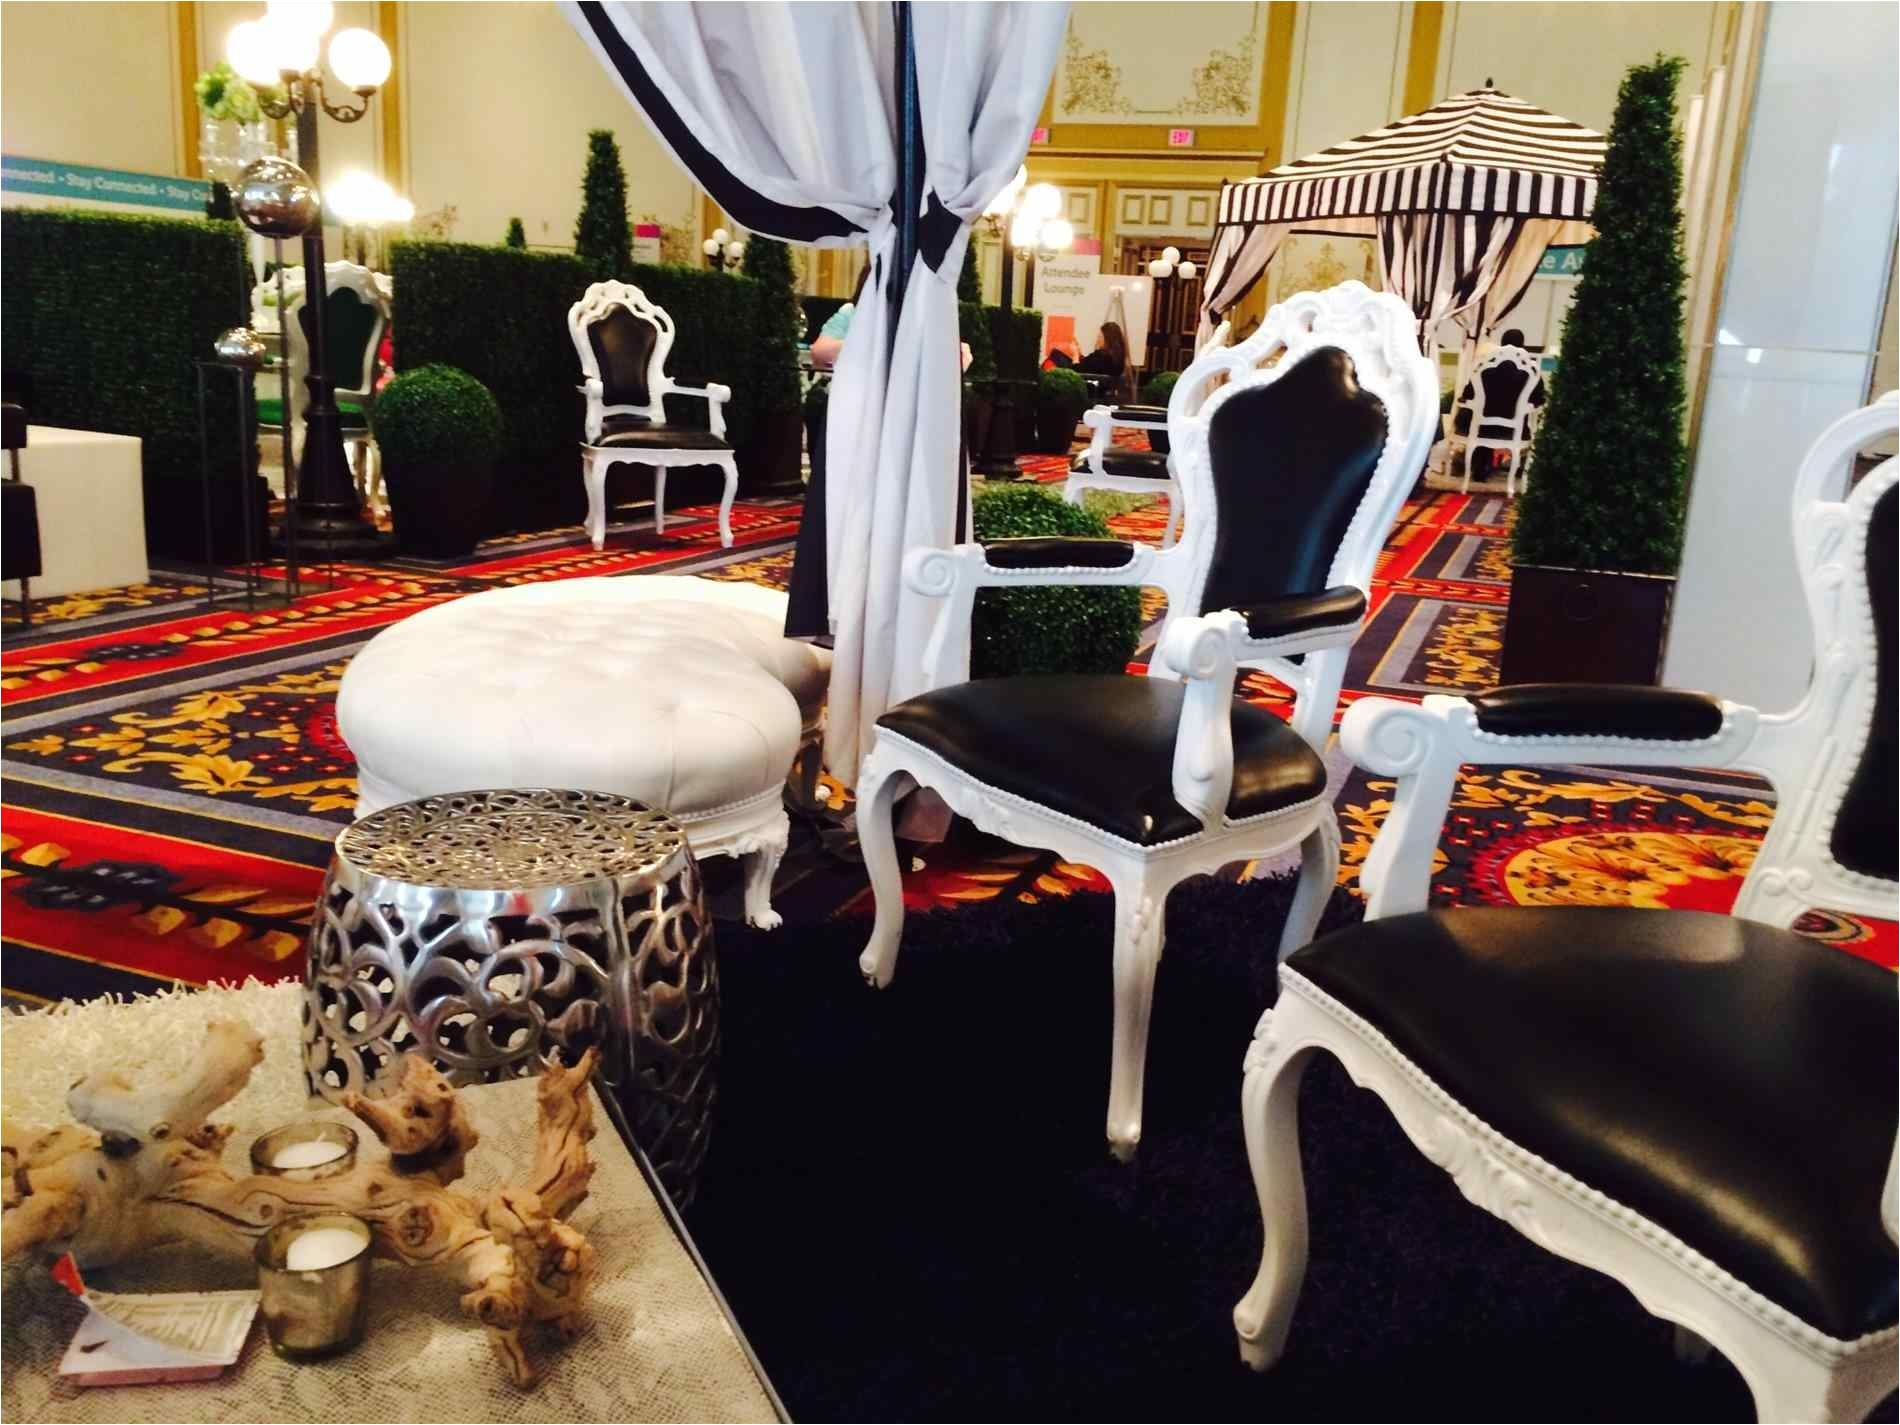 furniture event furniture rental nashville trendy cort event for all events and rhrockyslimscom rentals in miami